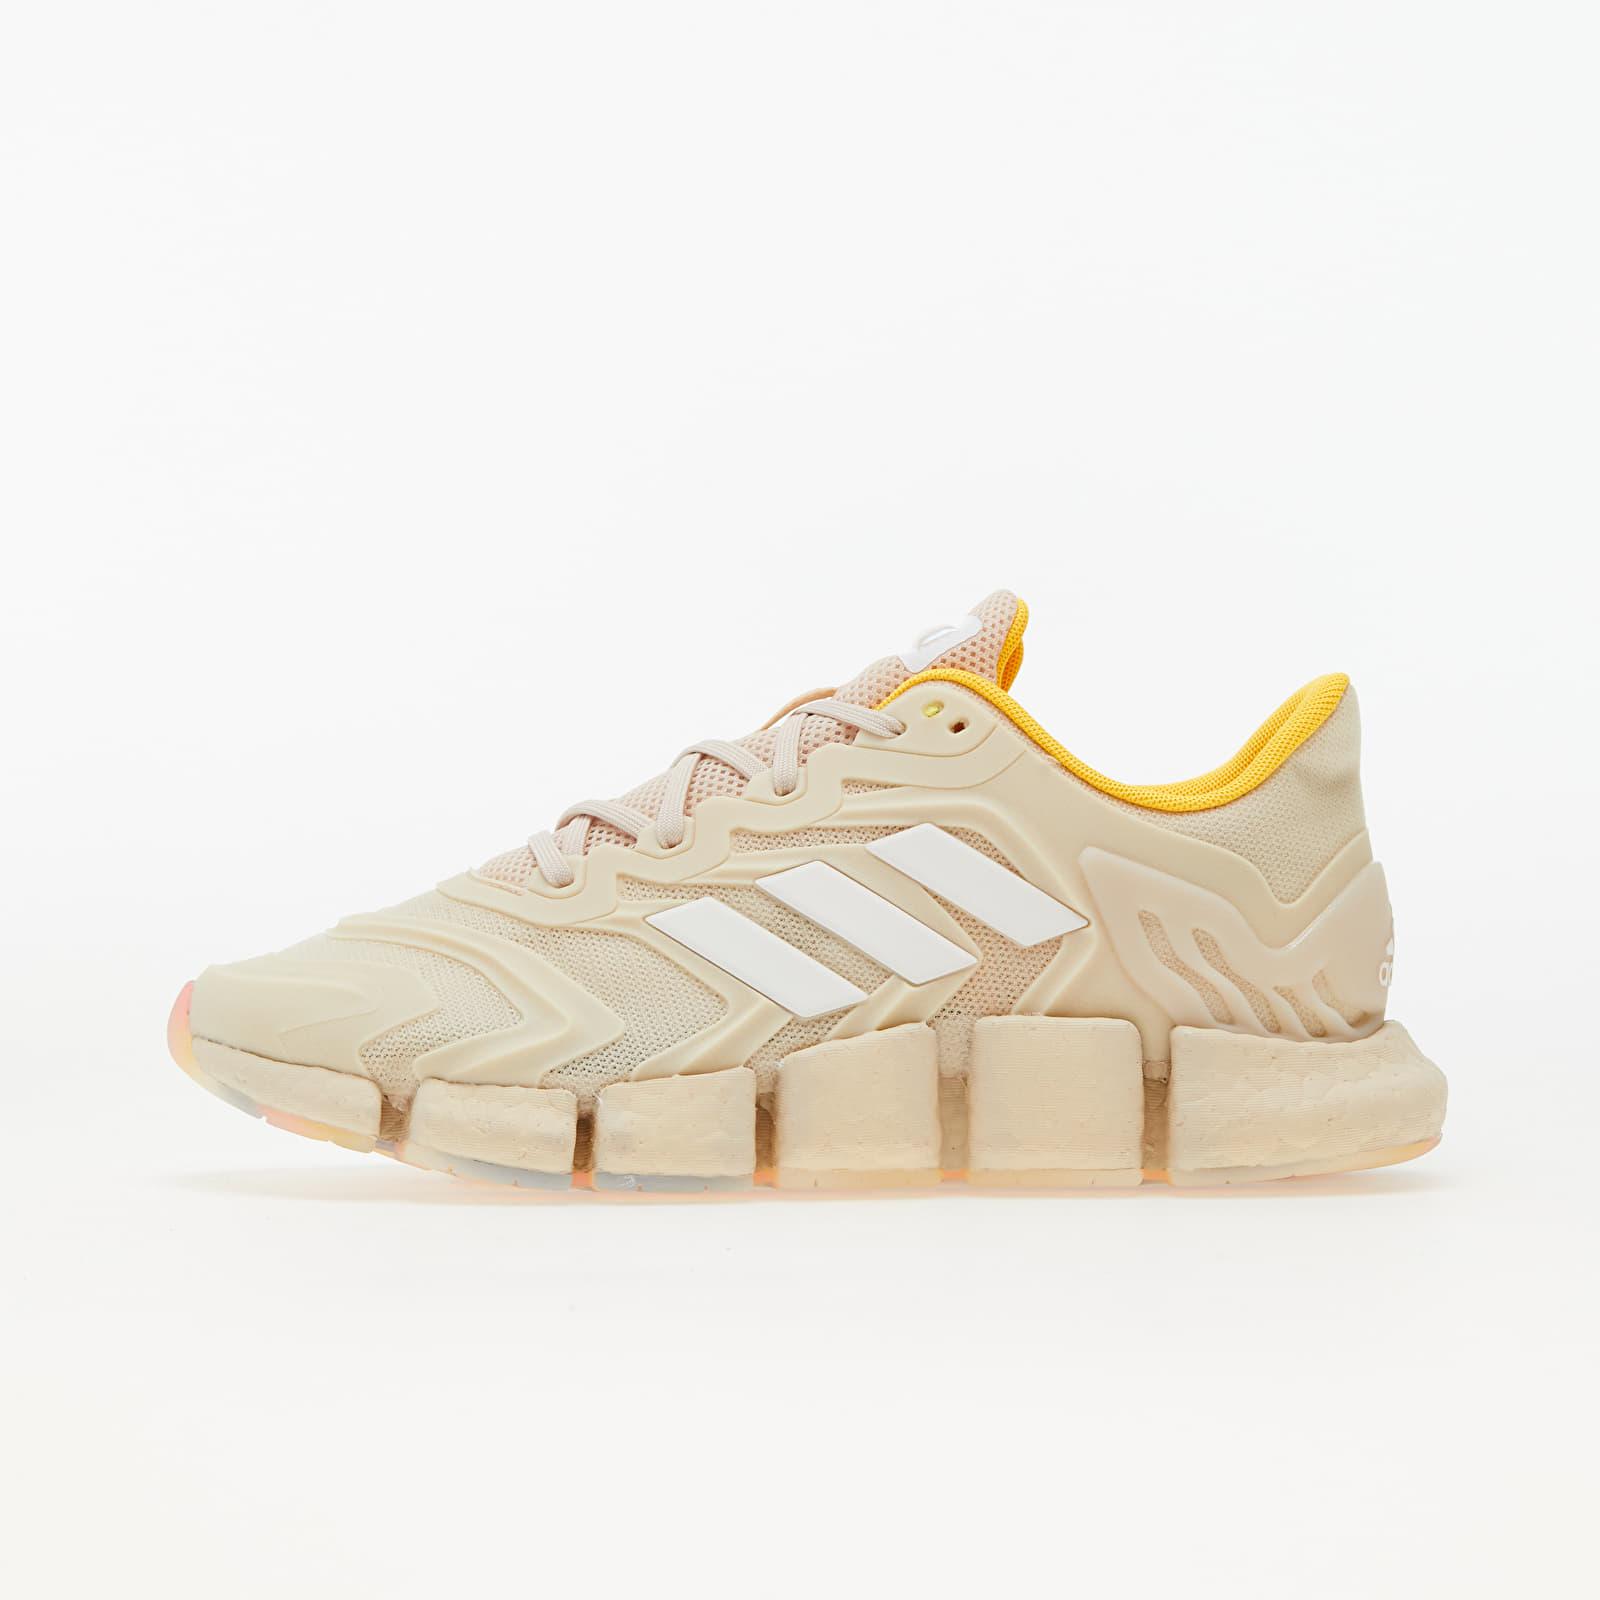 adidas Climacool Vento Halo Ivory/ Ftw White/ Worn White EUR 45 1/3